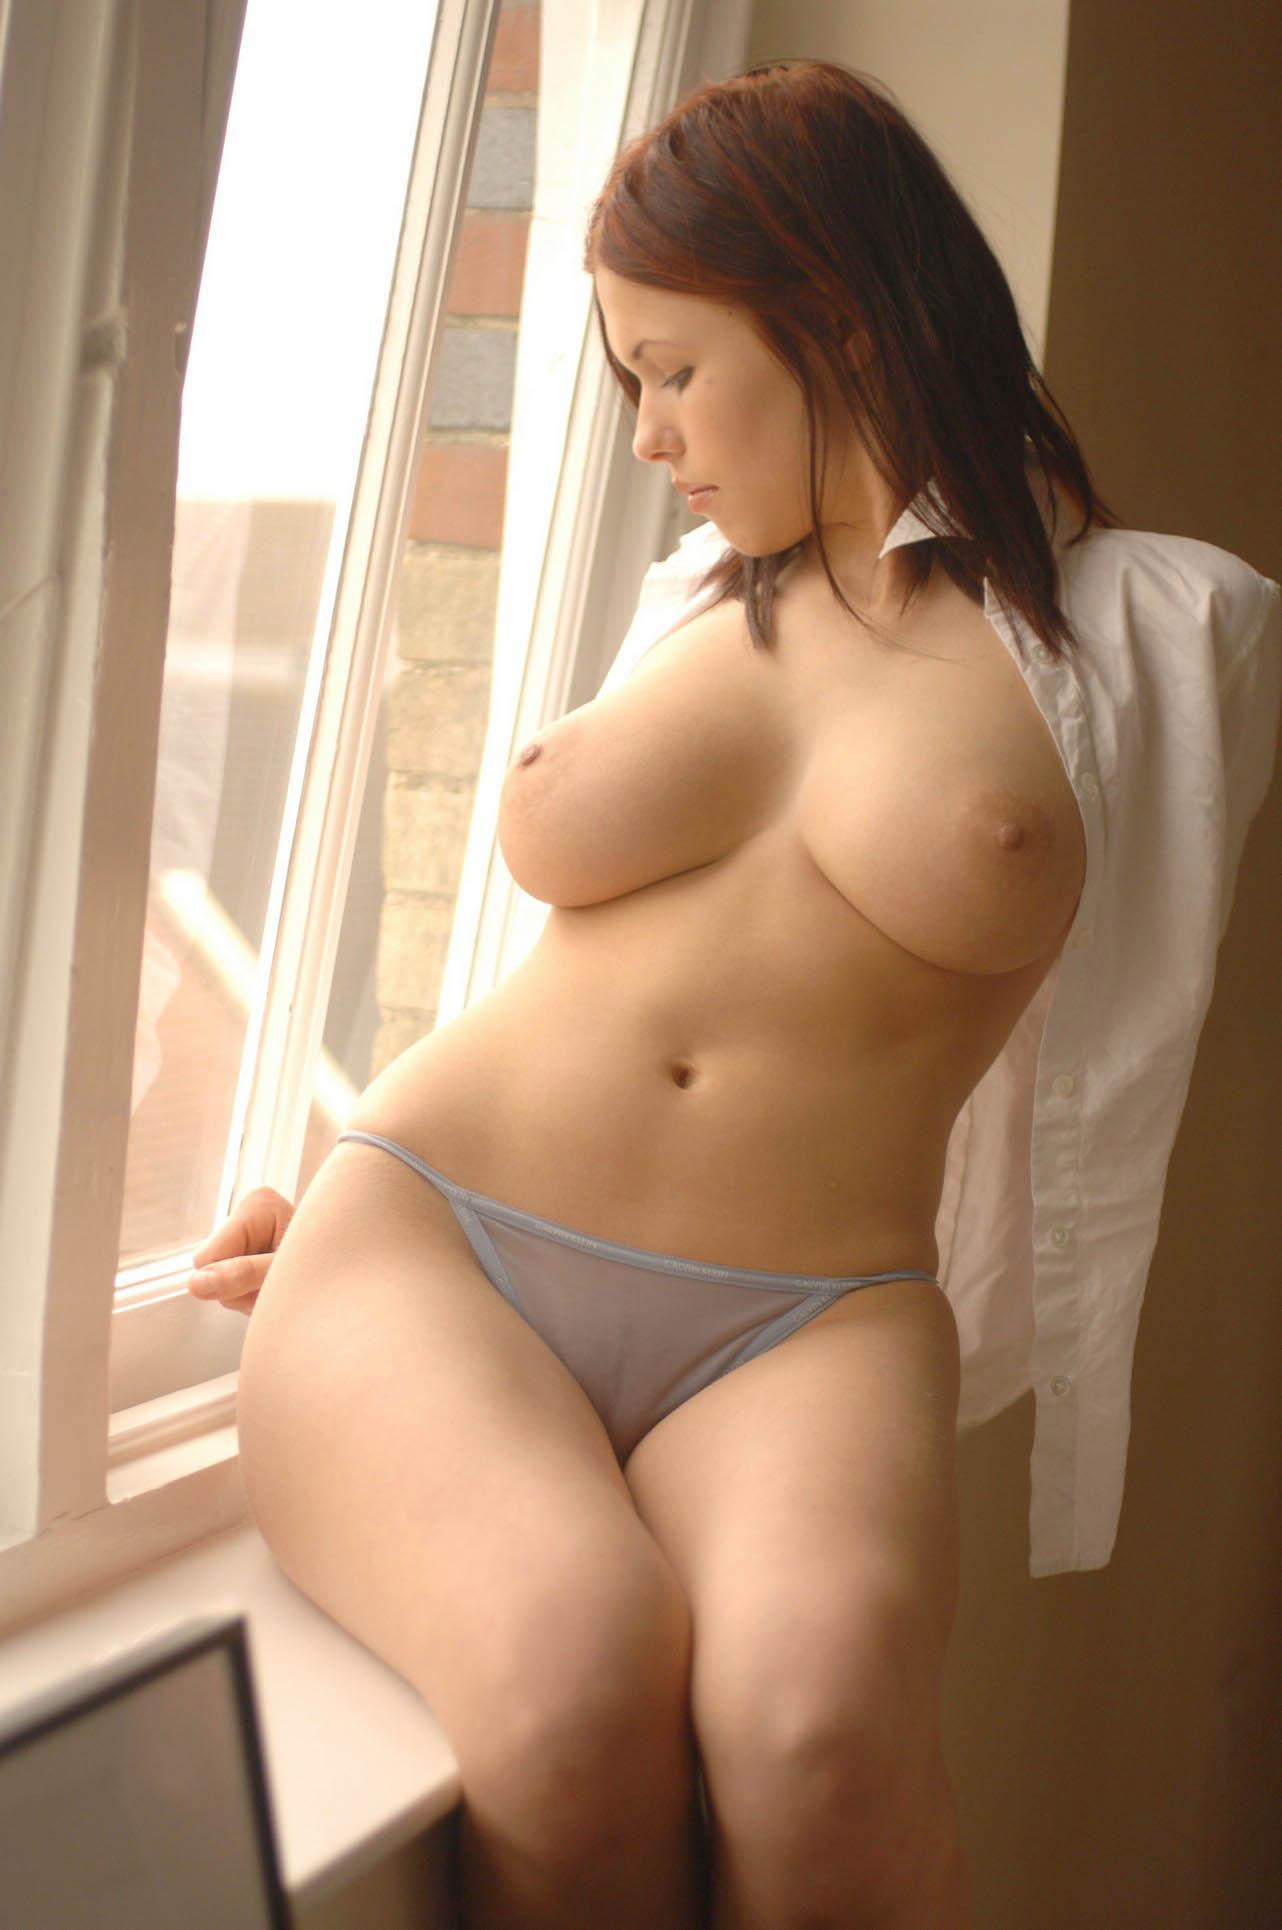 Polish Actress Iga Wyrwal Nude Photo Shoot